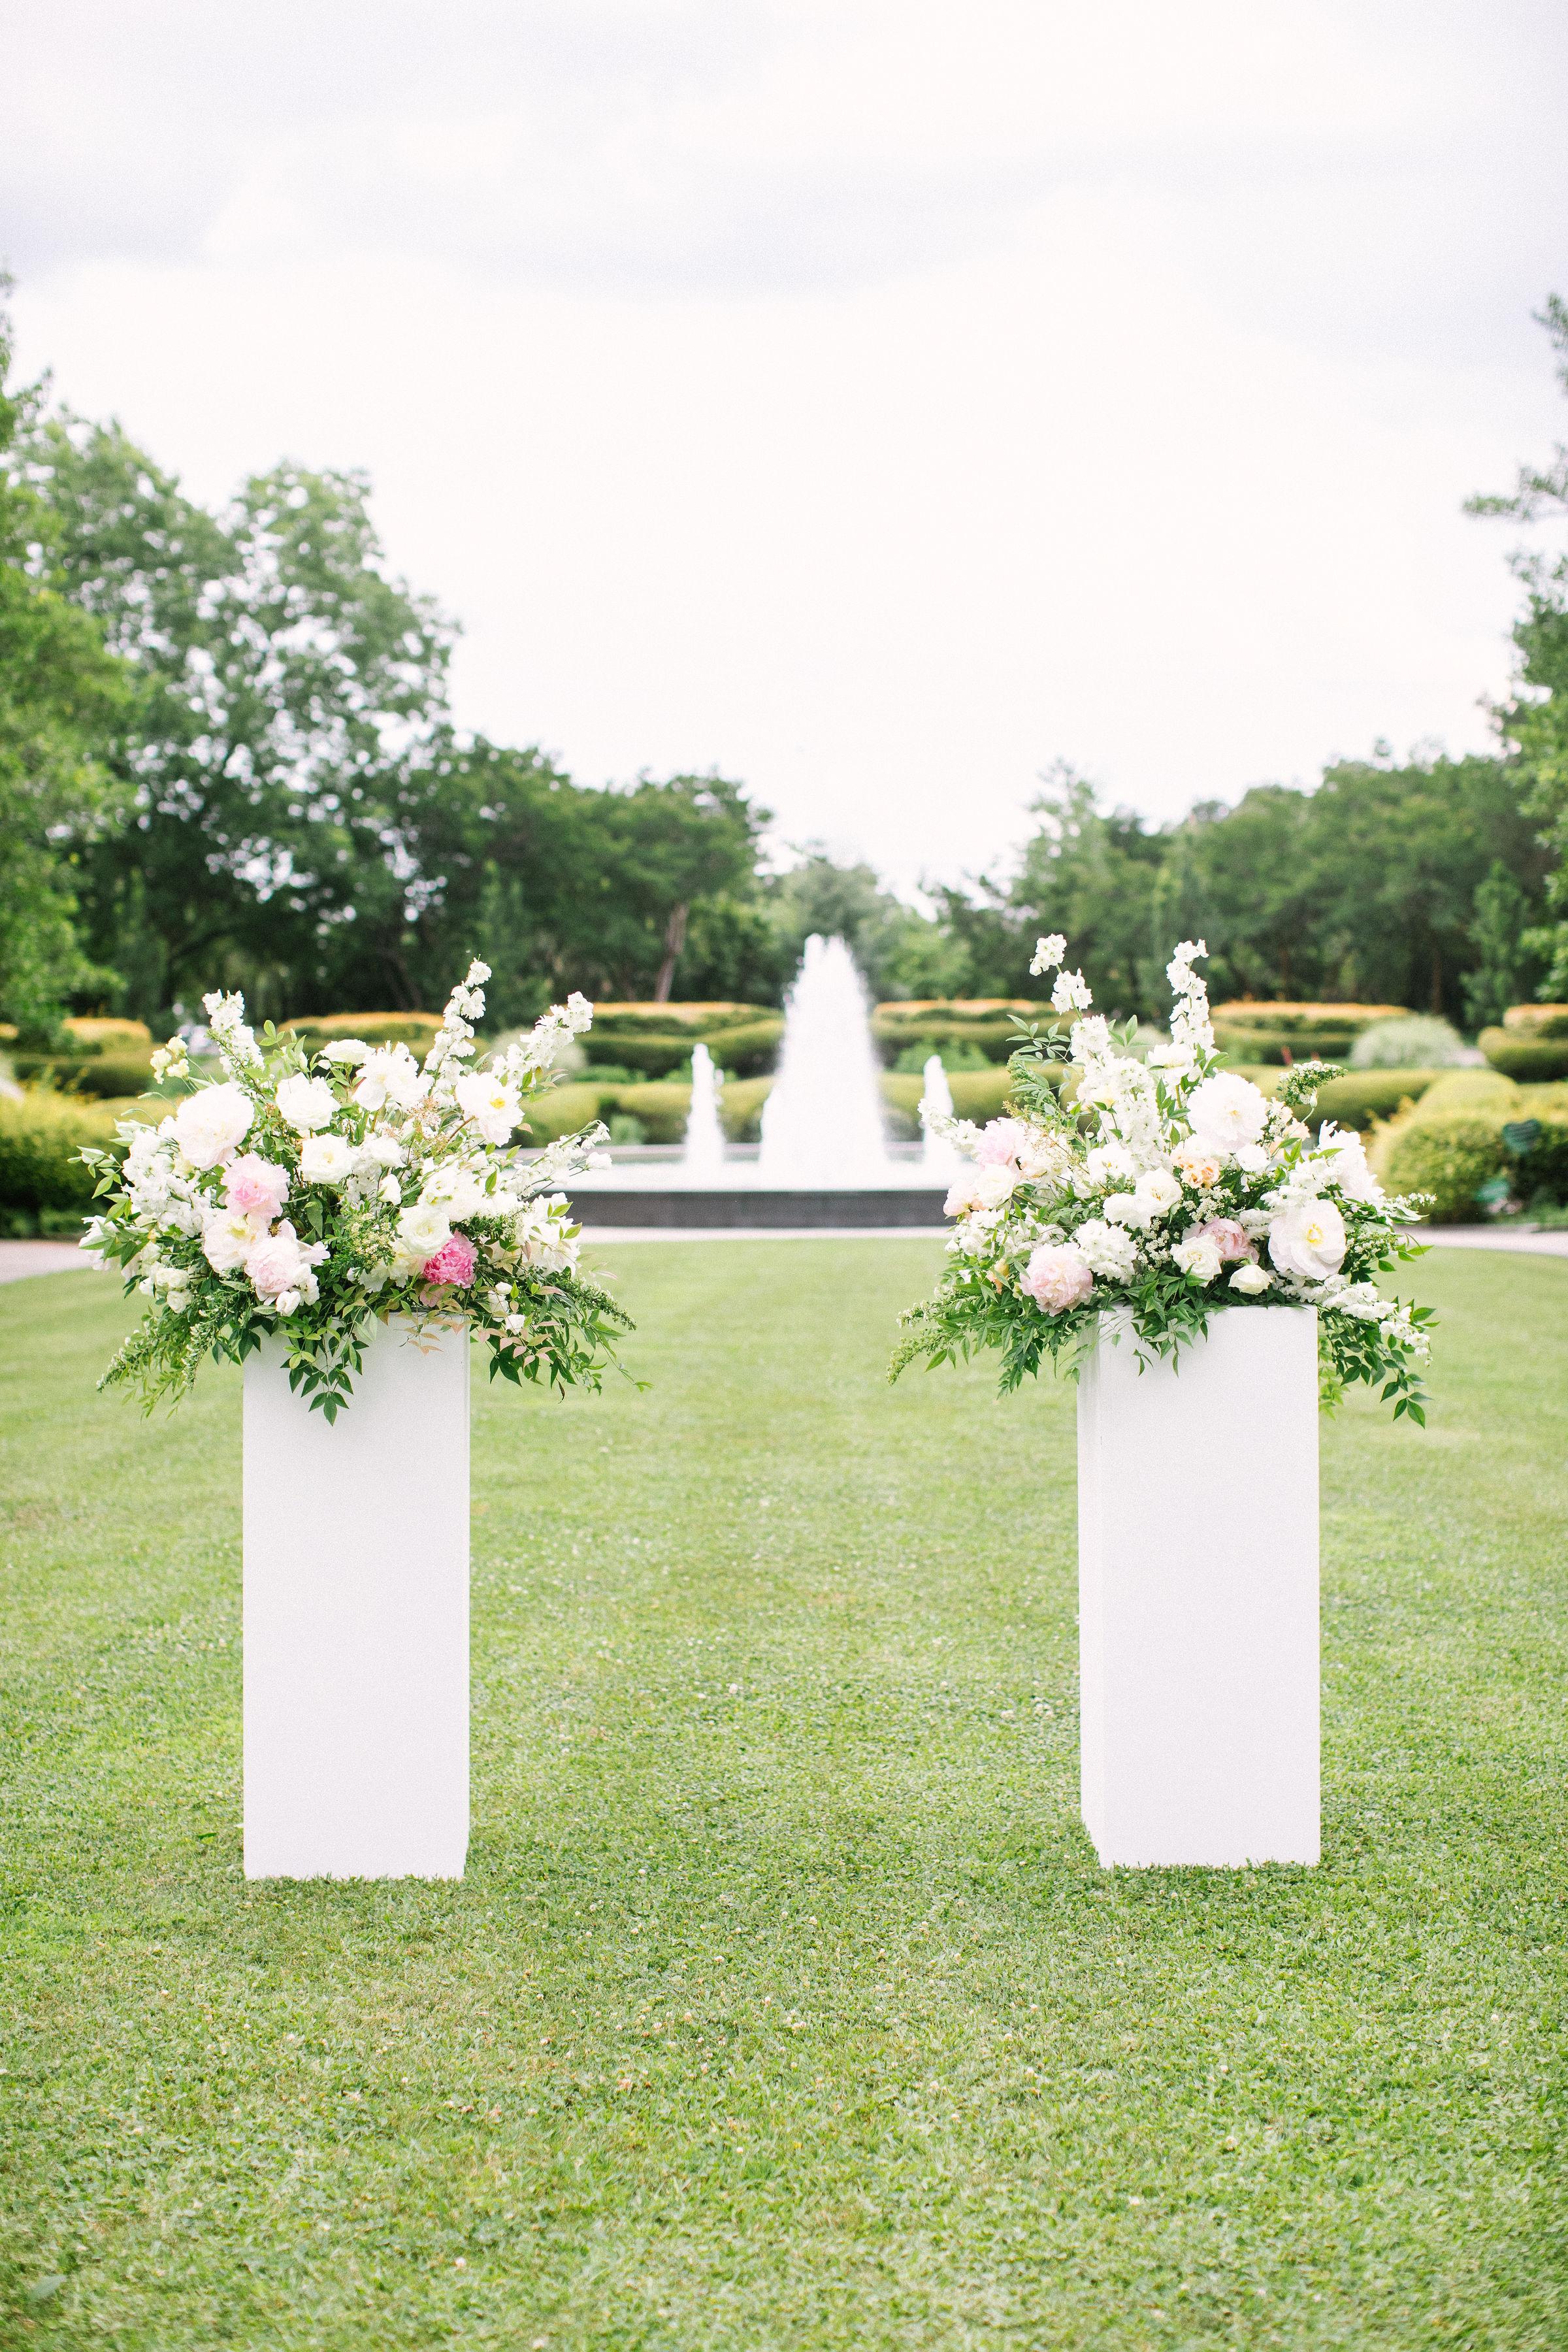 Ellen-Ashton-Photography-Dallas-Wedding-Photographers-Ivory-and-vine-Weddings-348.jpg